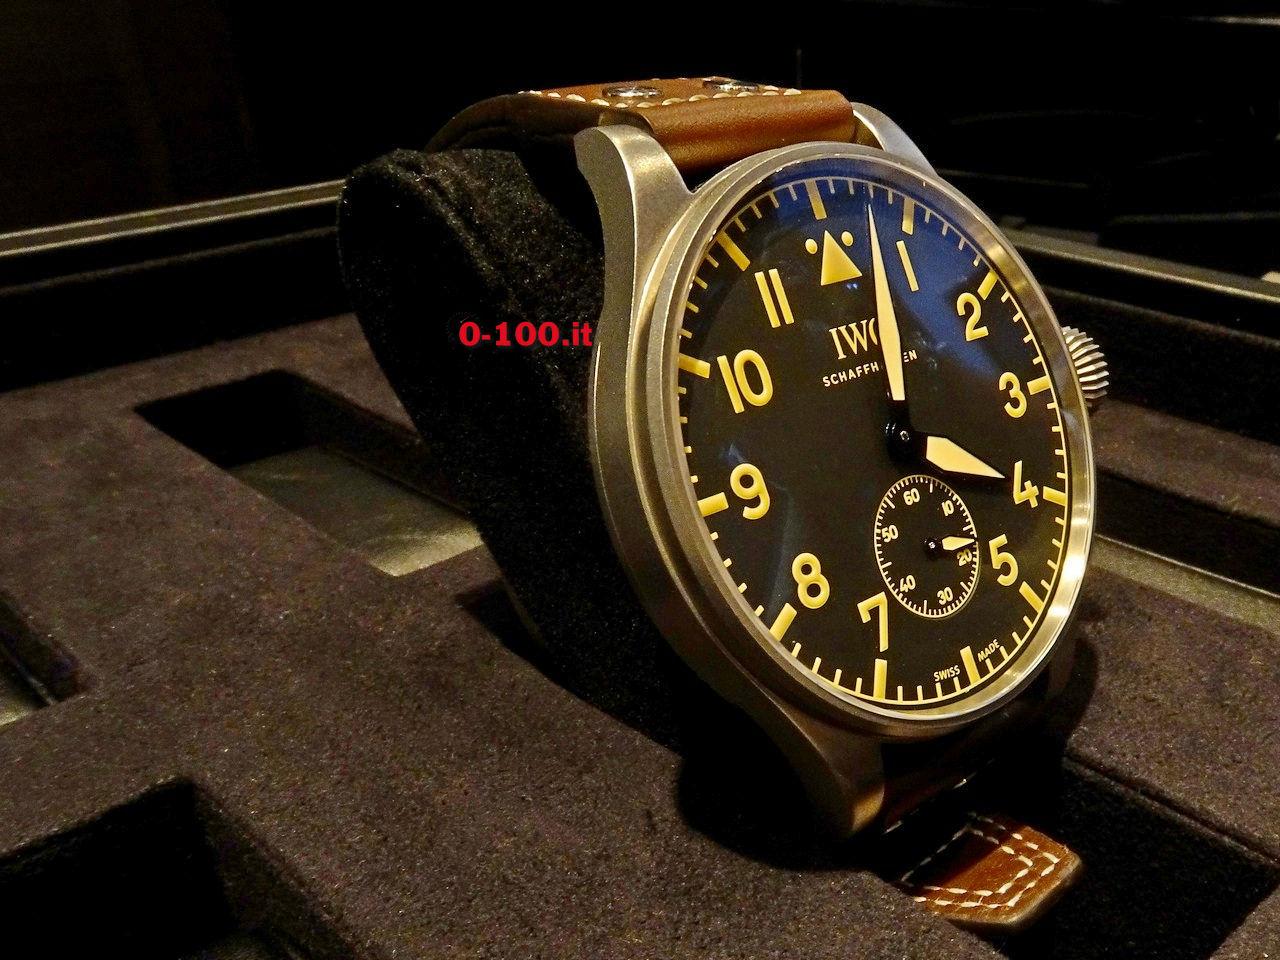 IWC_pilot_heritage-55-prezzo-price-0-100_1